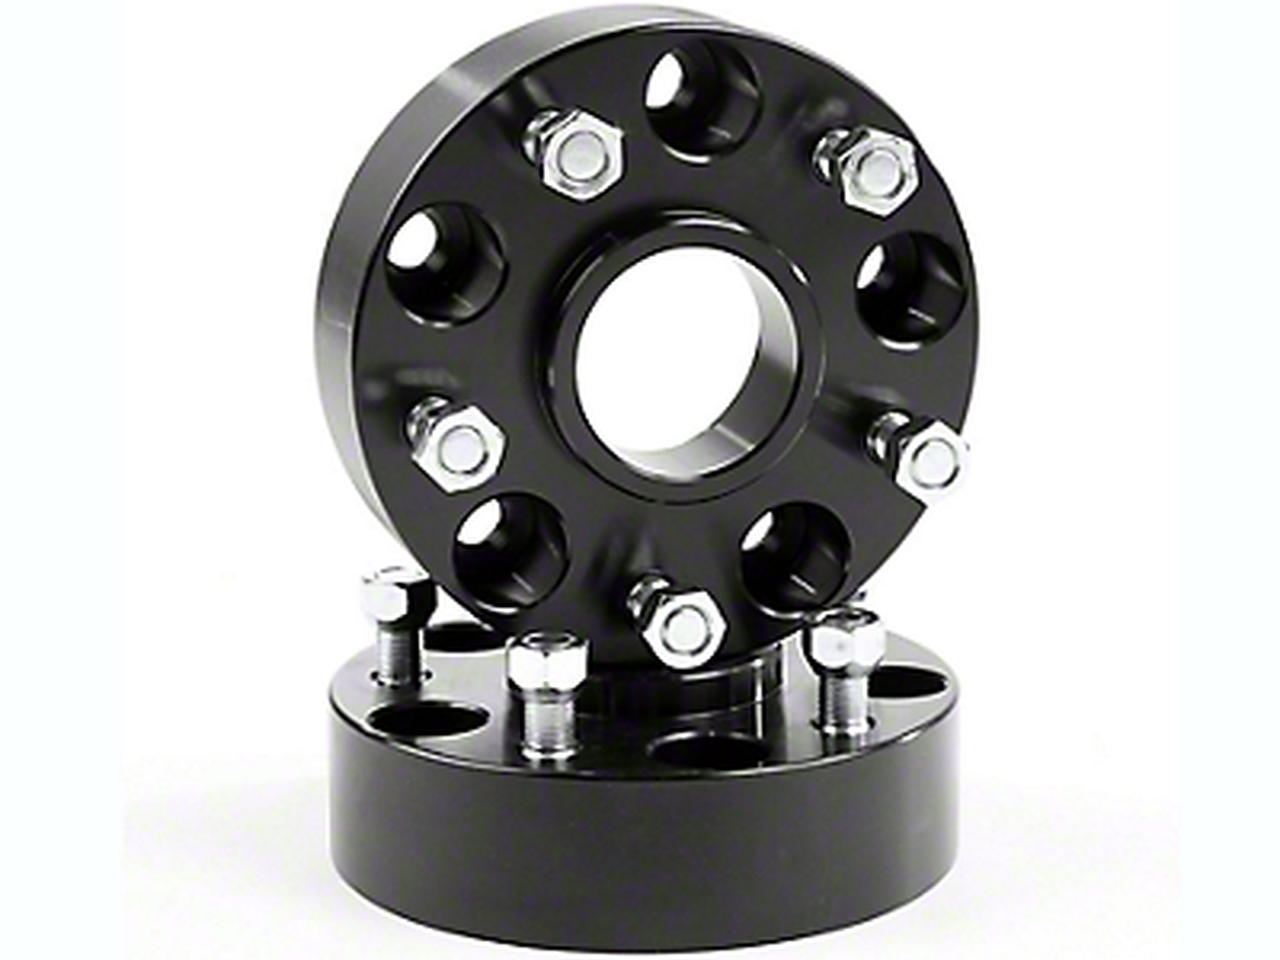 Rugged Ridge Wheel Spacers, Black, 1.75-Inch (07-17 Wrangler JK)